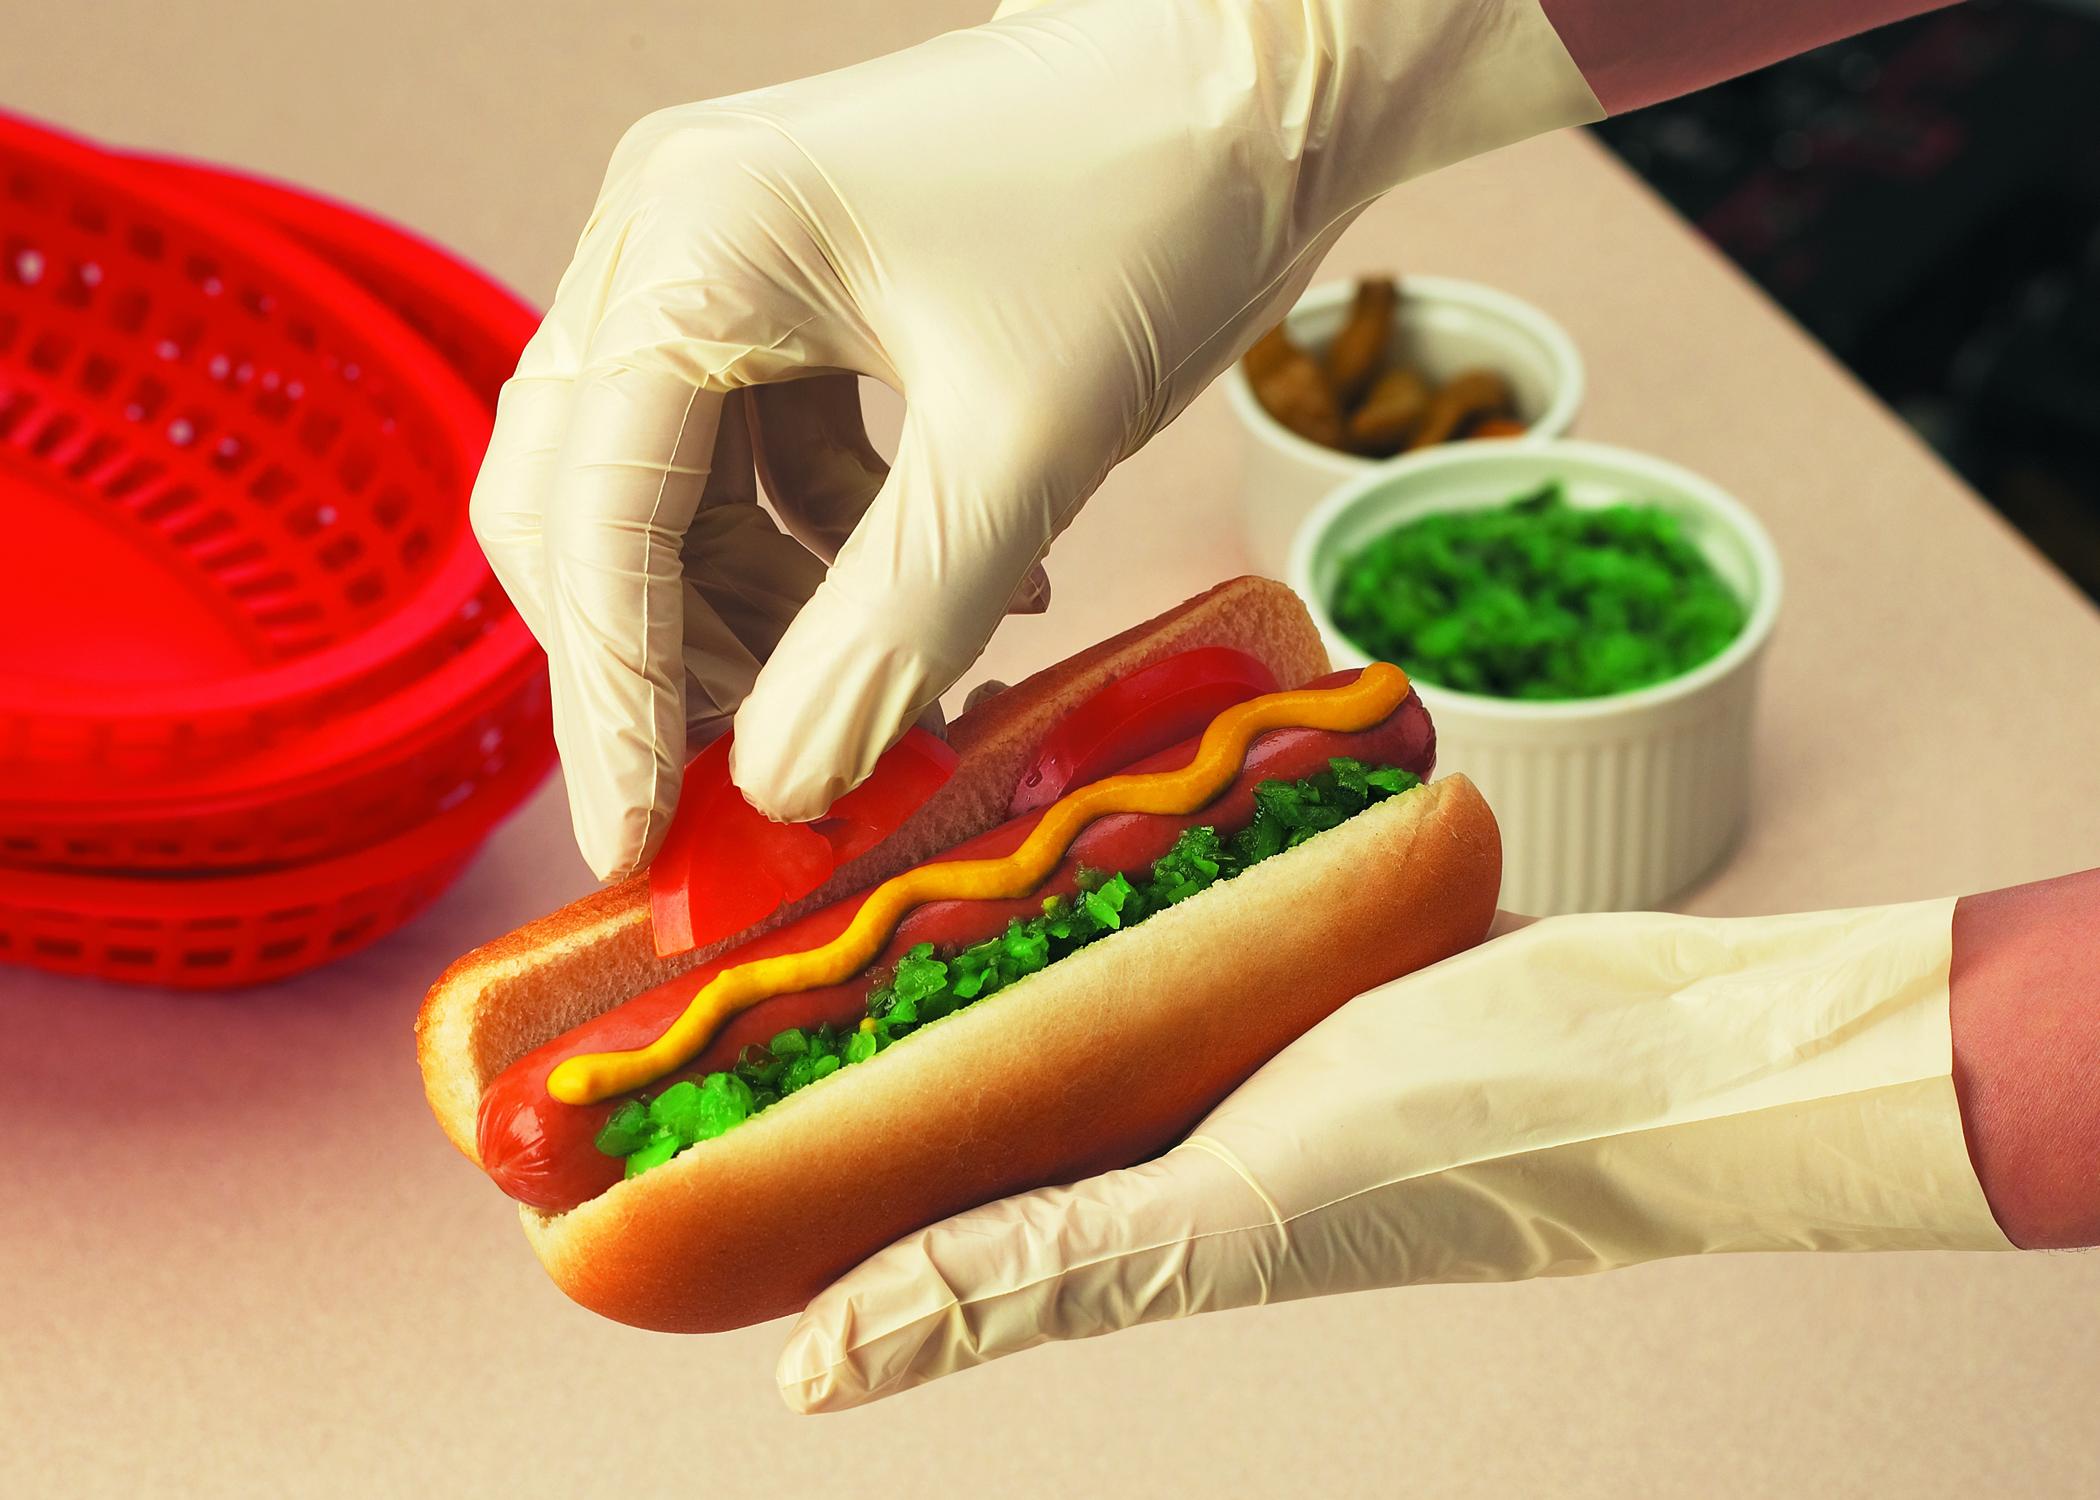 Foodhandler Epic 174 Hybrid Gloves Receive U S Patent